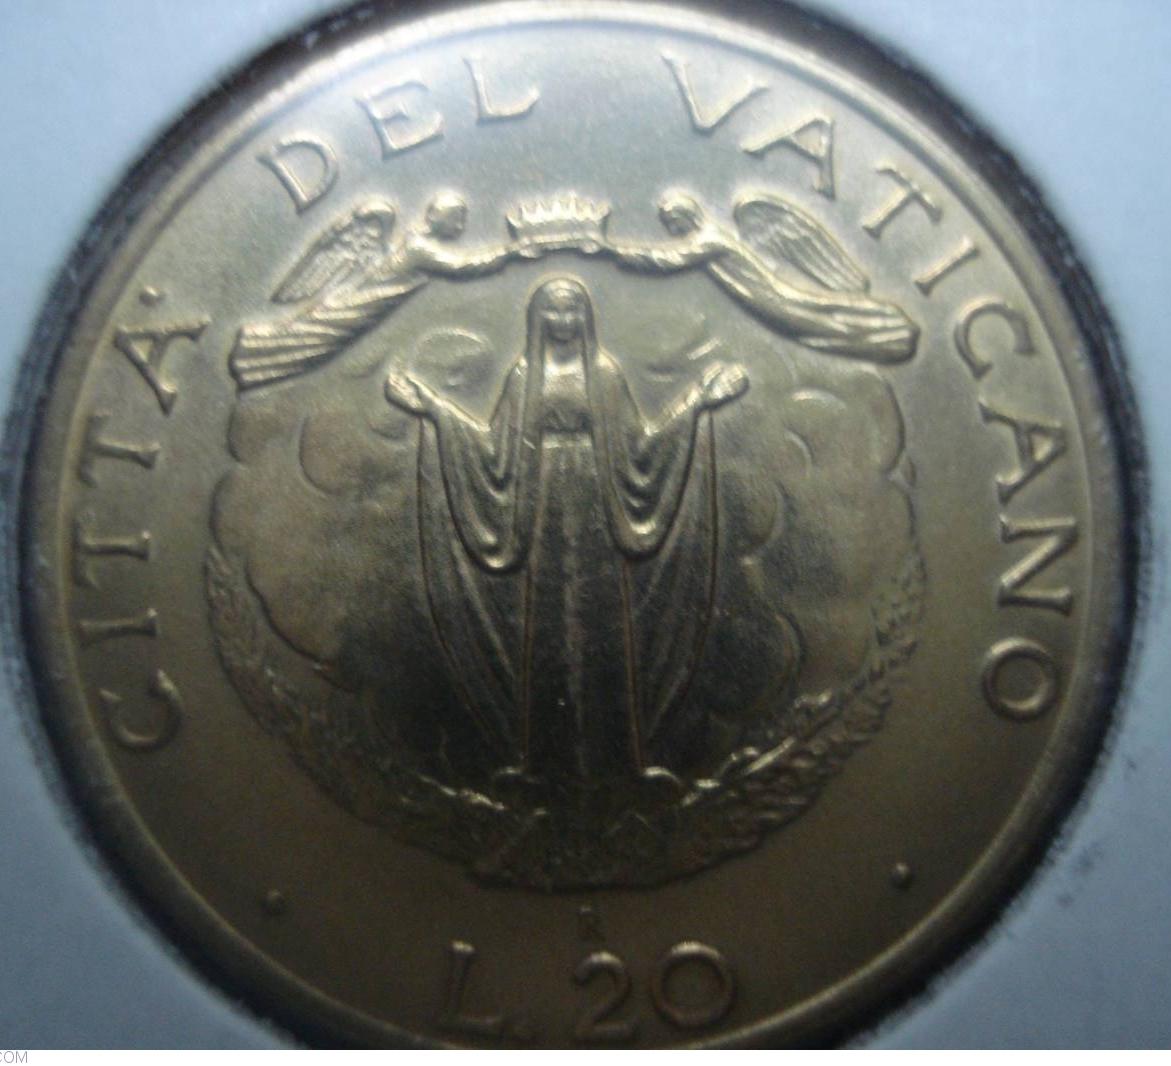 FDC VATICANO 20 Lire 1987 2.539